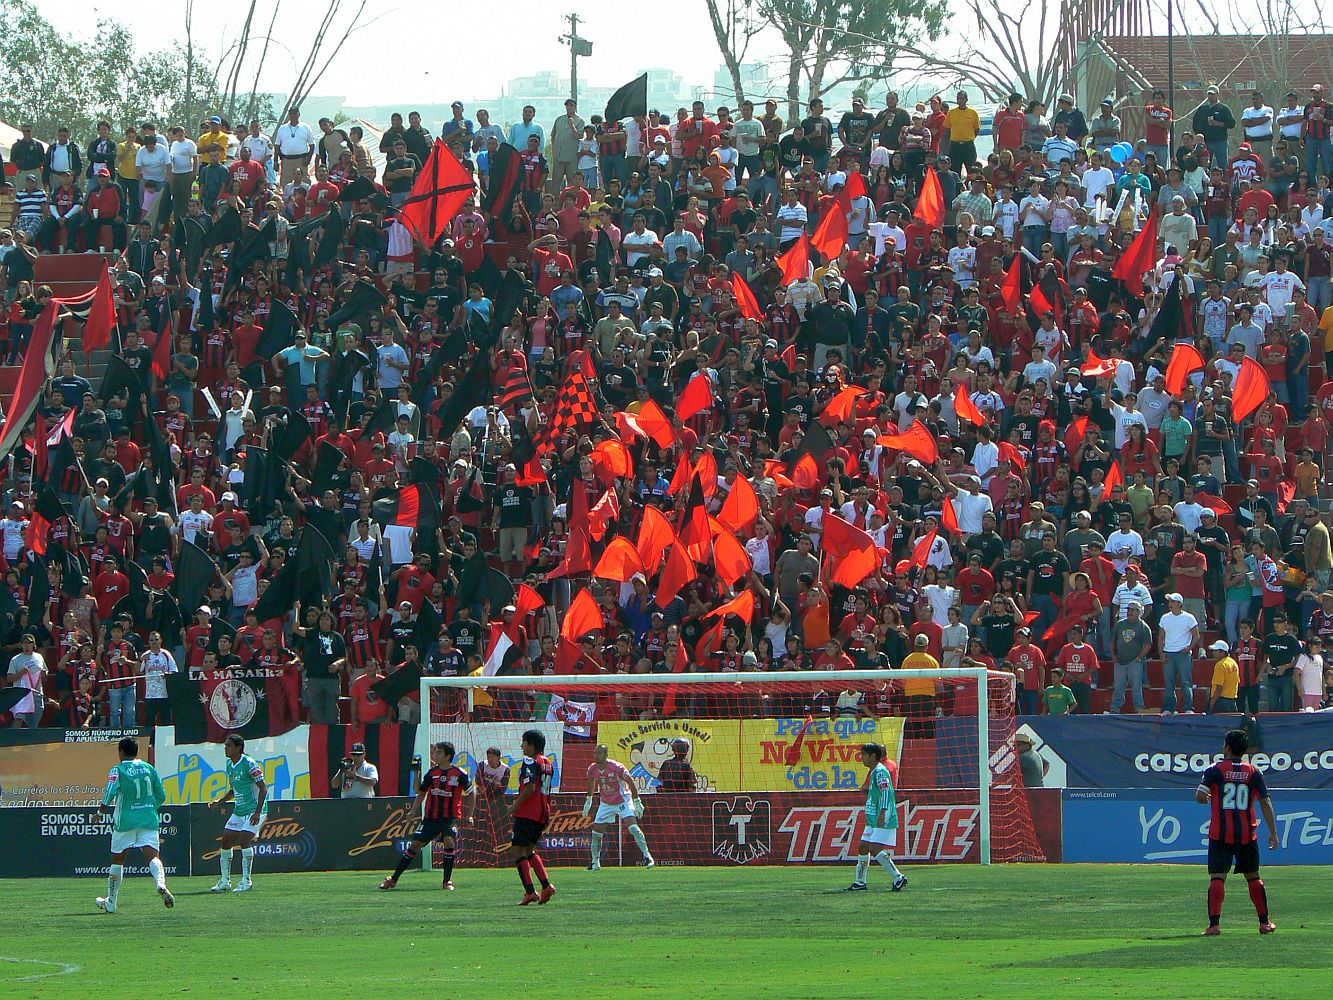 [Festeja+Xoloitzcuintles+un++=?iso-8859-1?Q?a=F1o_en_el_Estadio_Caliente_con_n=FAmeros_positivos-756143.jpg?=+]